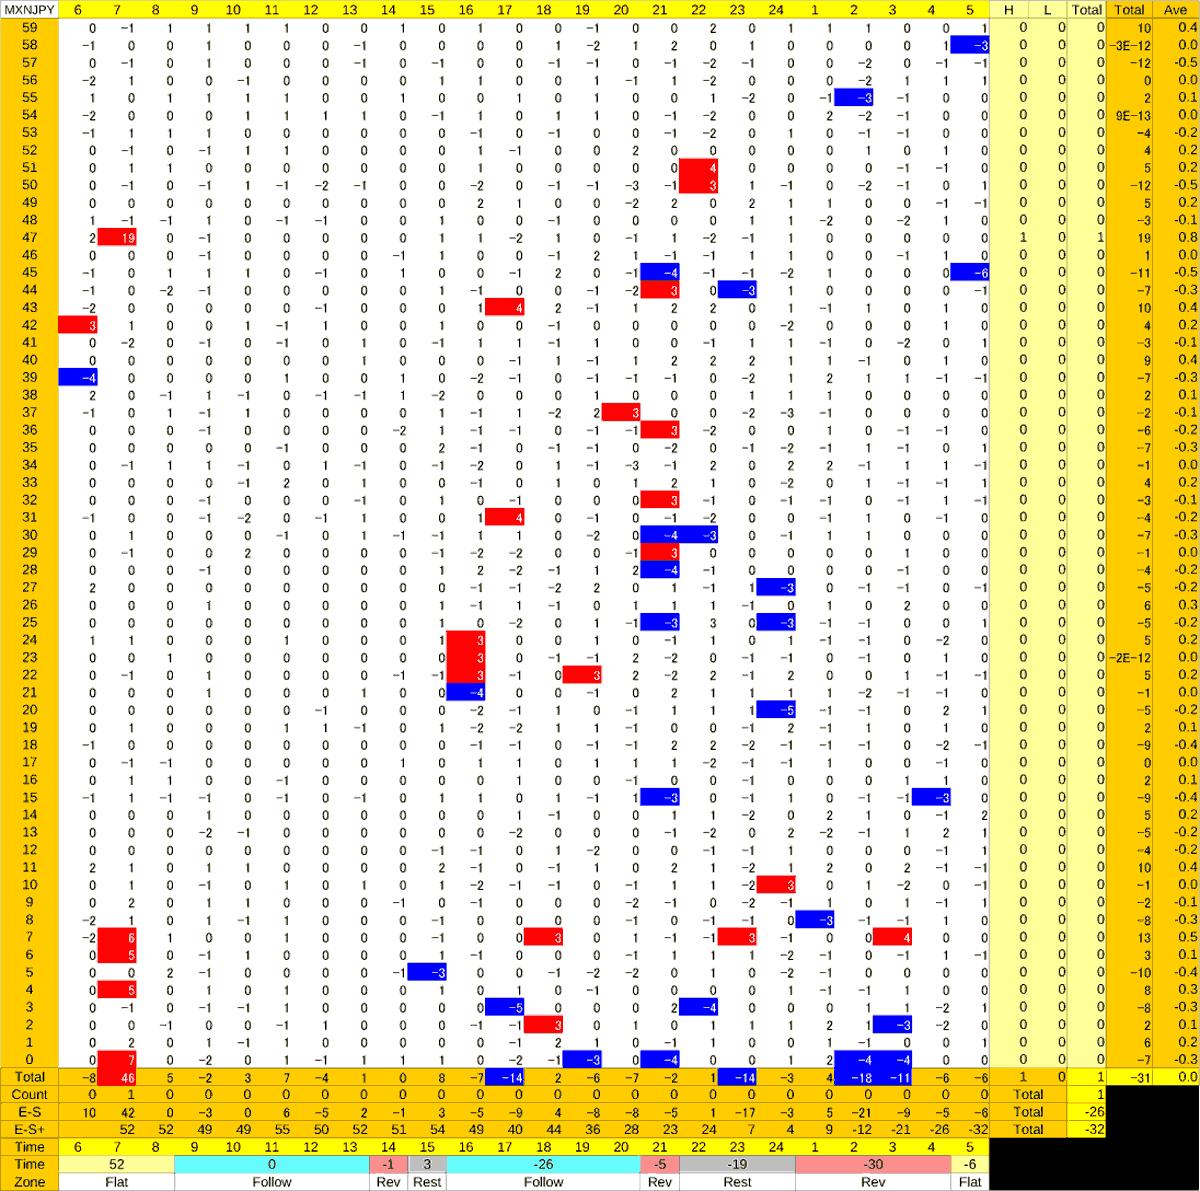 20200817_HS(3)MXNJPY